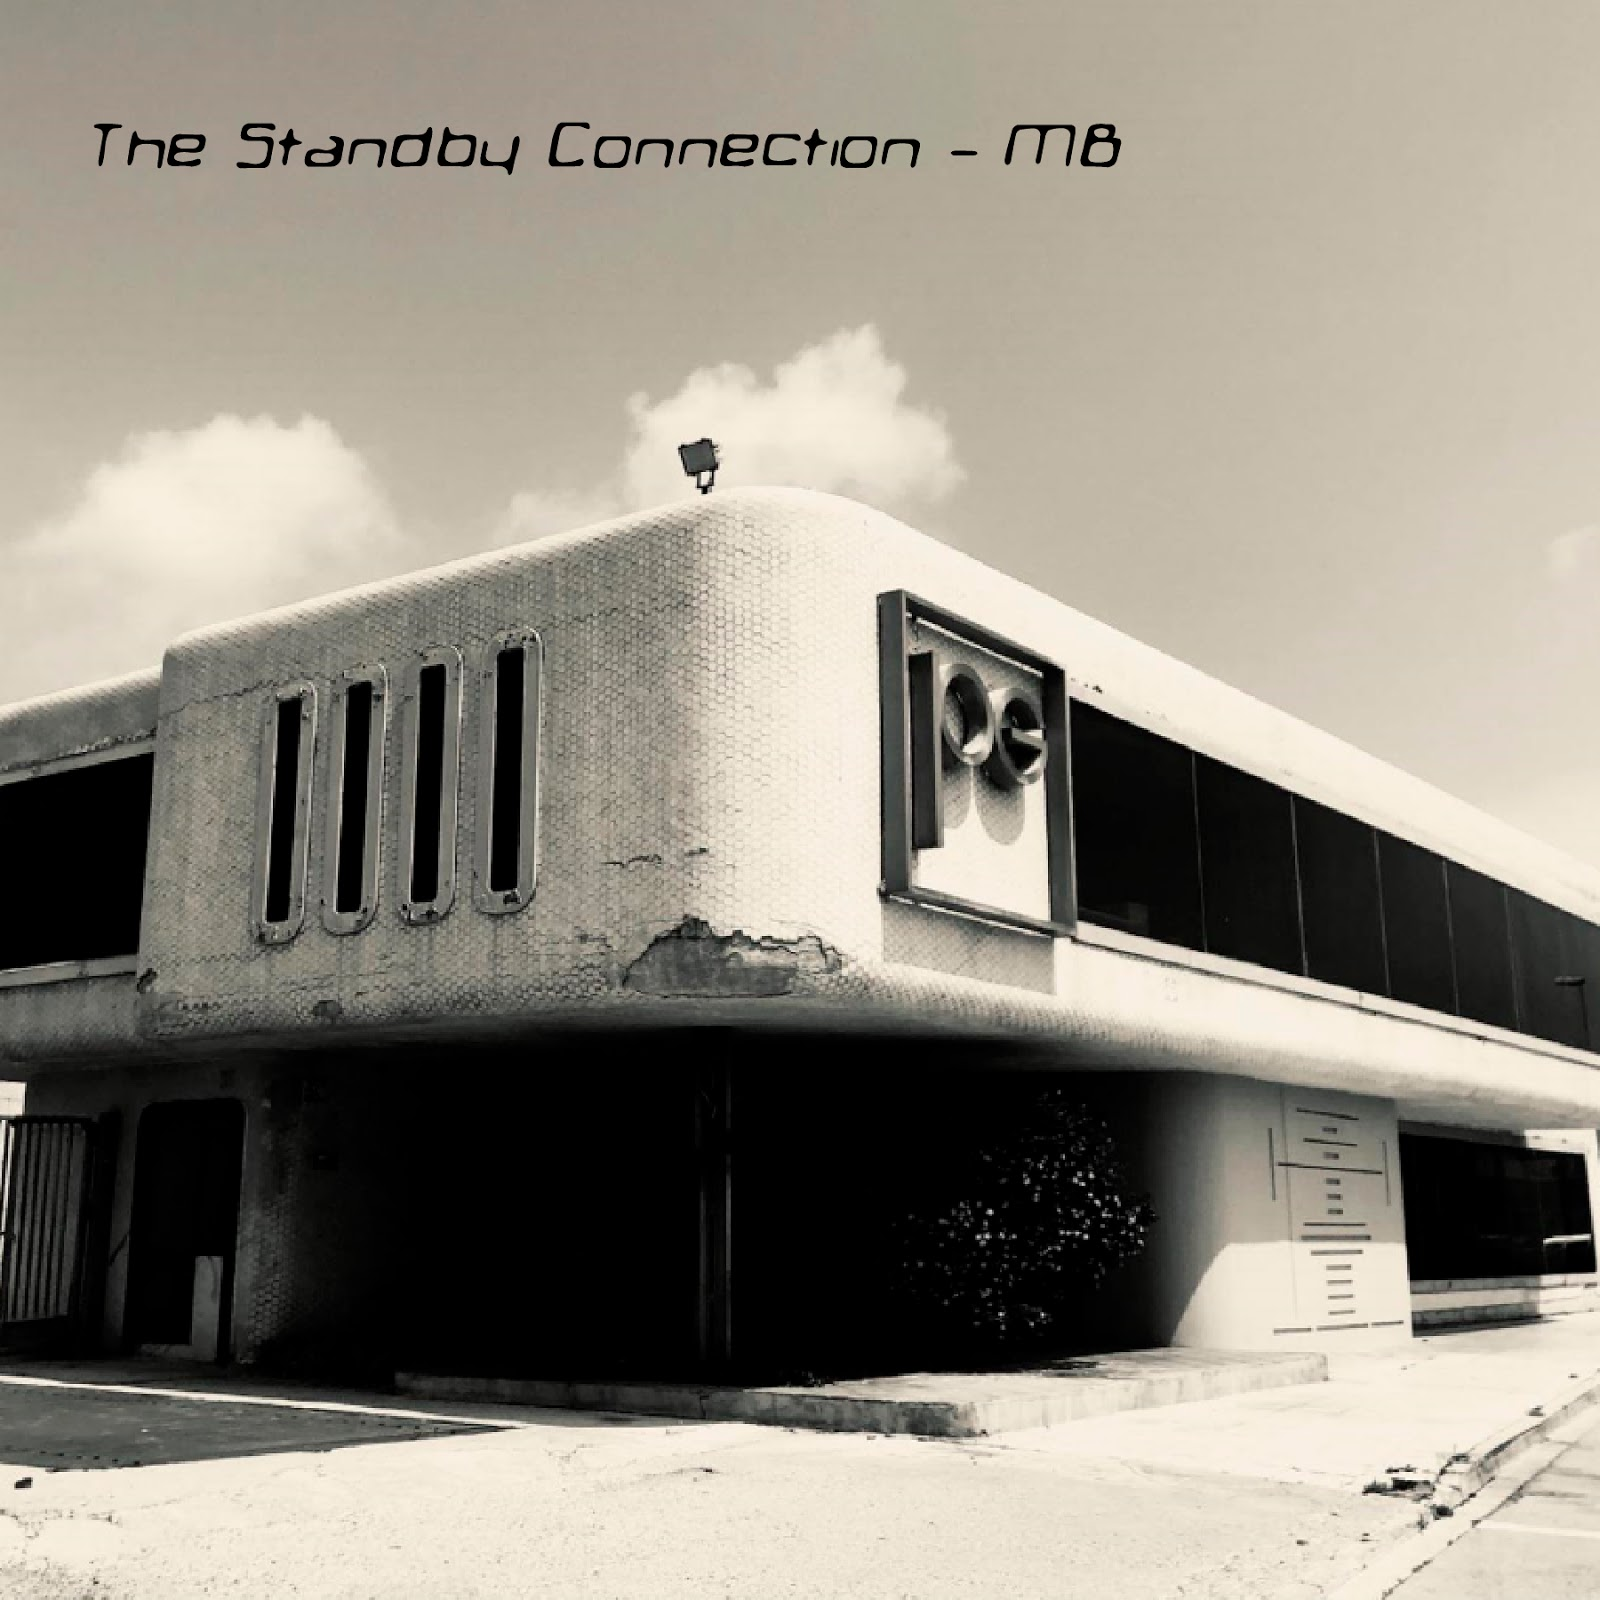 MB, single de The Standbye Connection